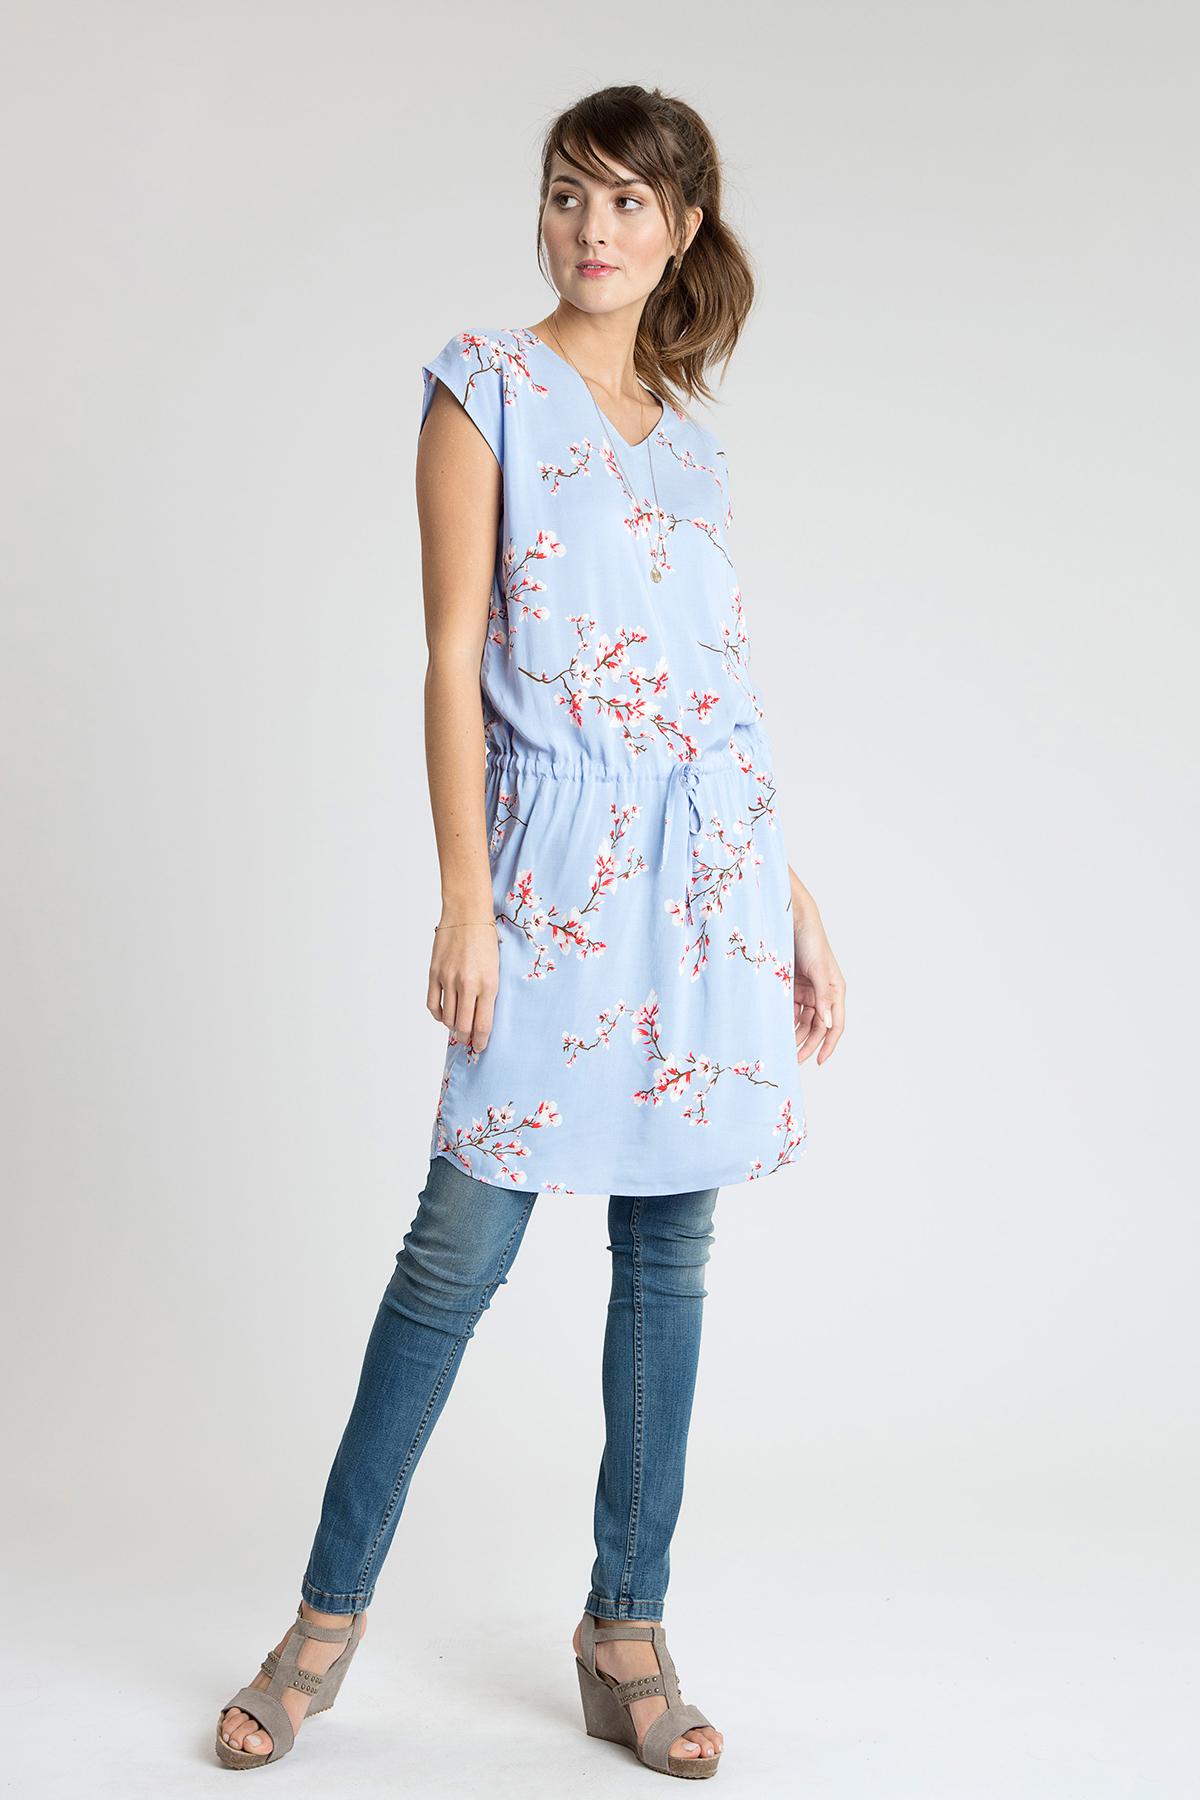 Hellblau/rot Kleid von b.young – Shoppen Sie Hellblau/rot Kleid ab Gr. 34-46 hier